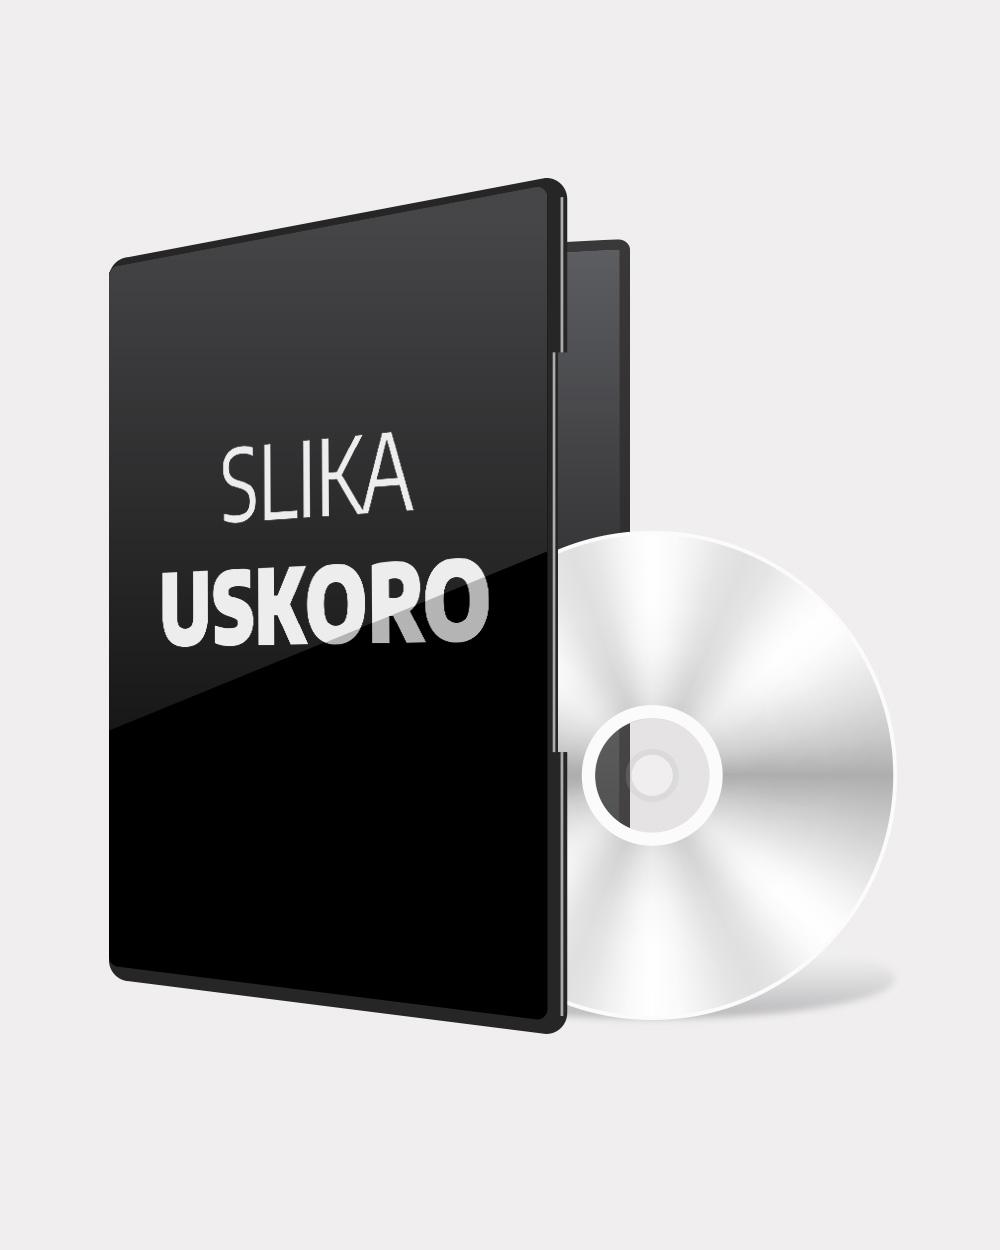 XBOX ONE Dragons Dogma - Dark Arisen HD